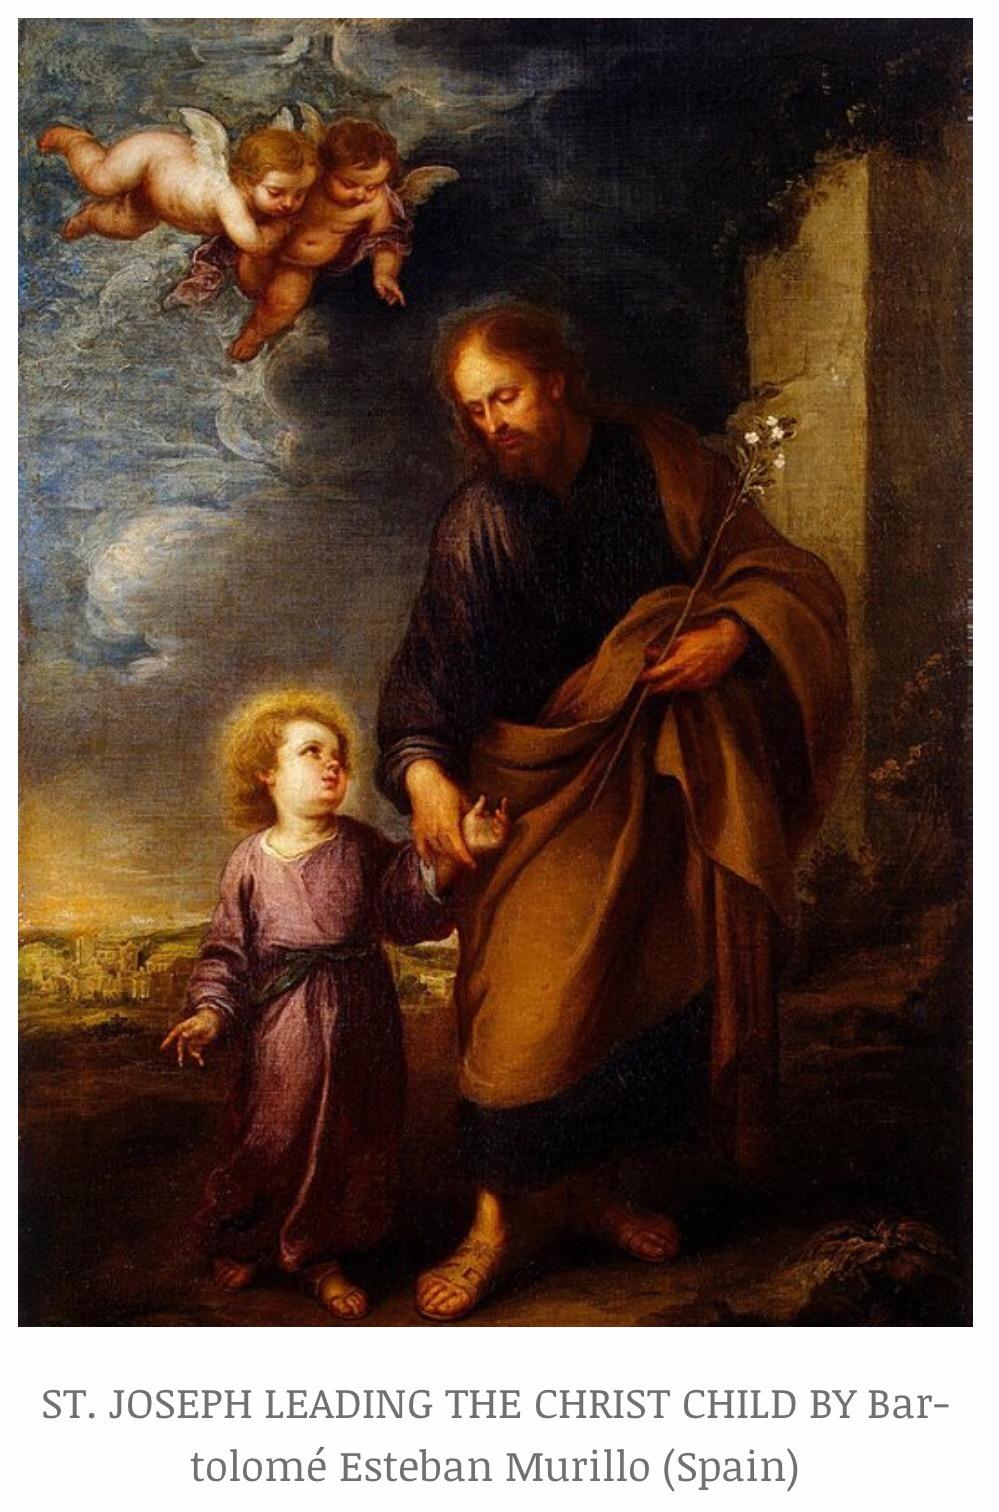 Saint Joseph, we need your help